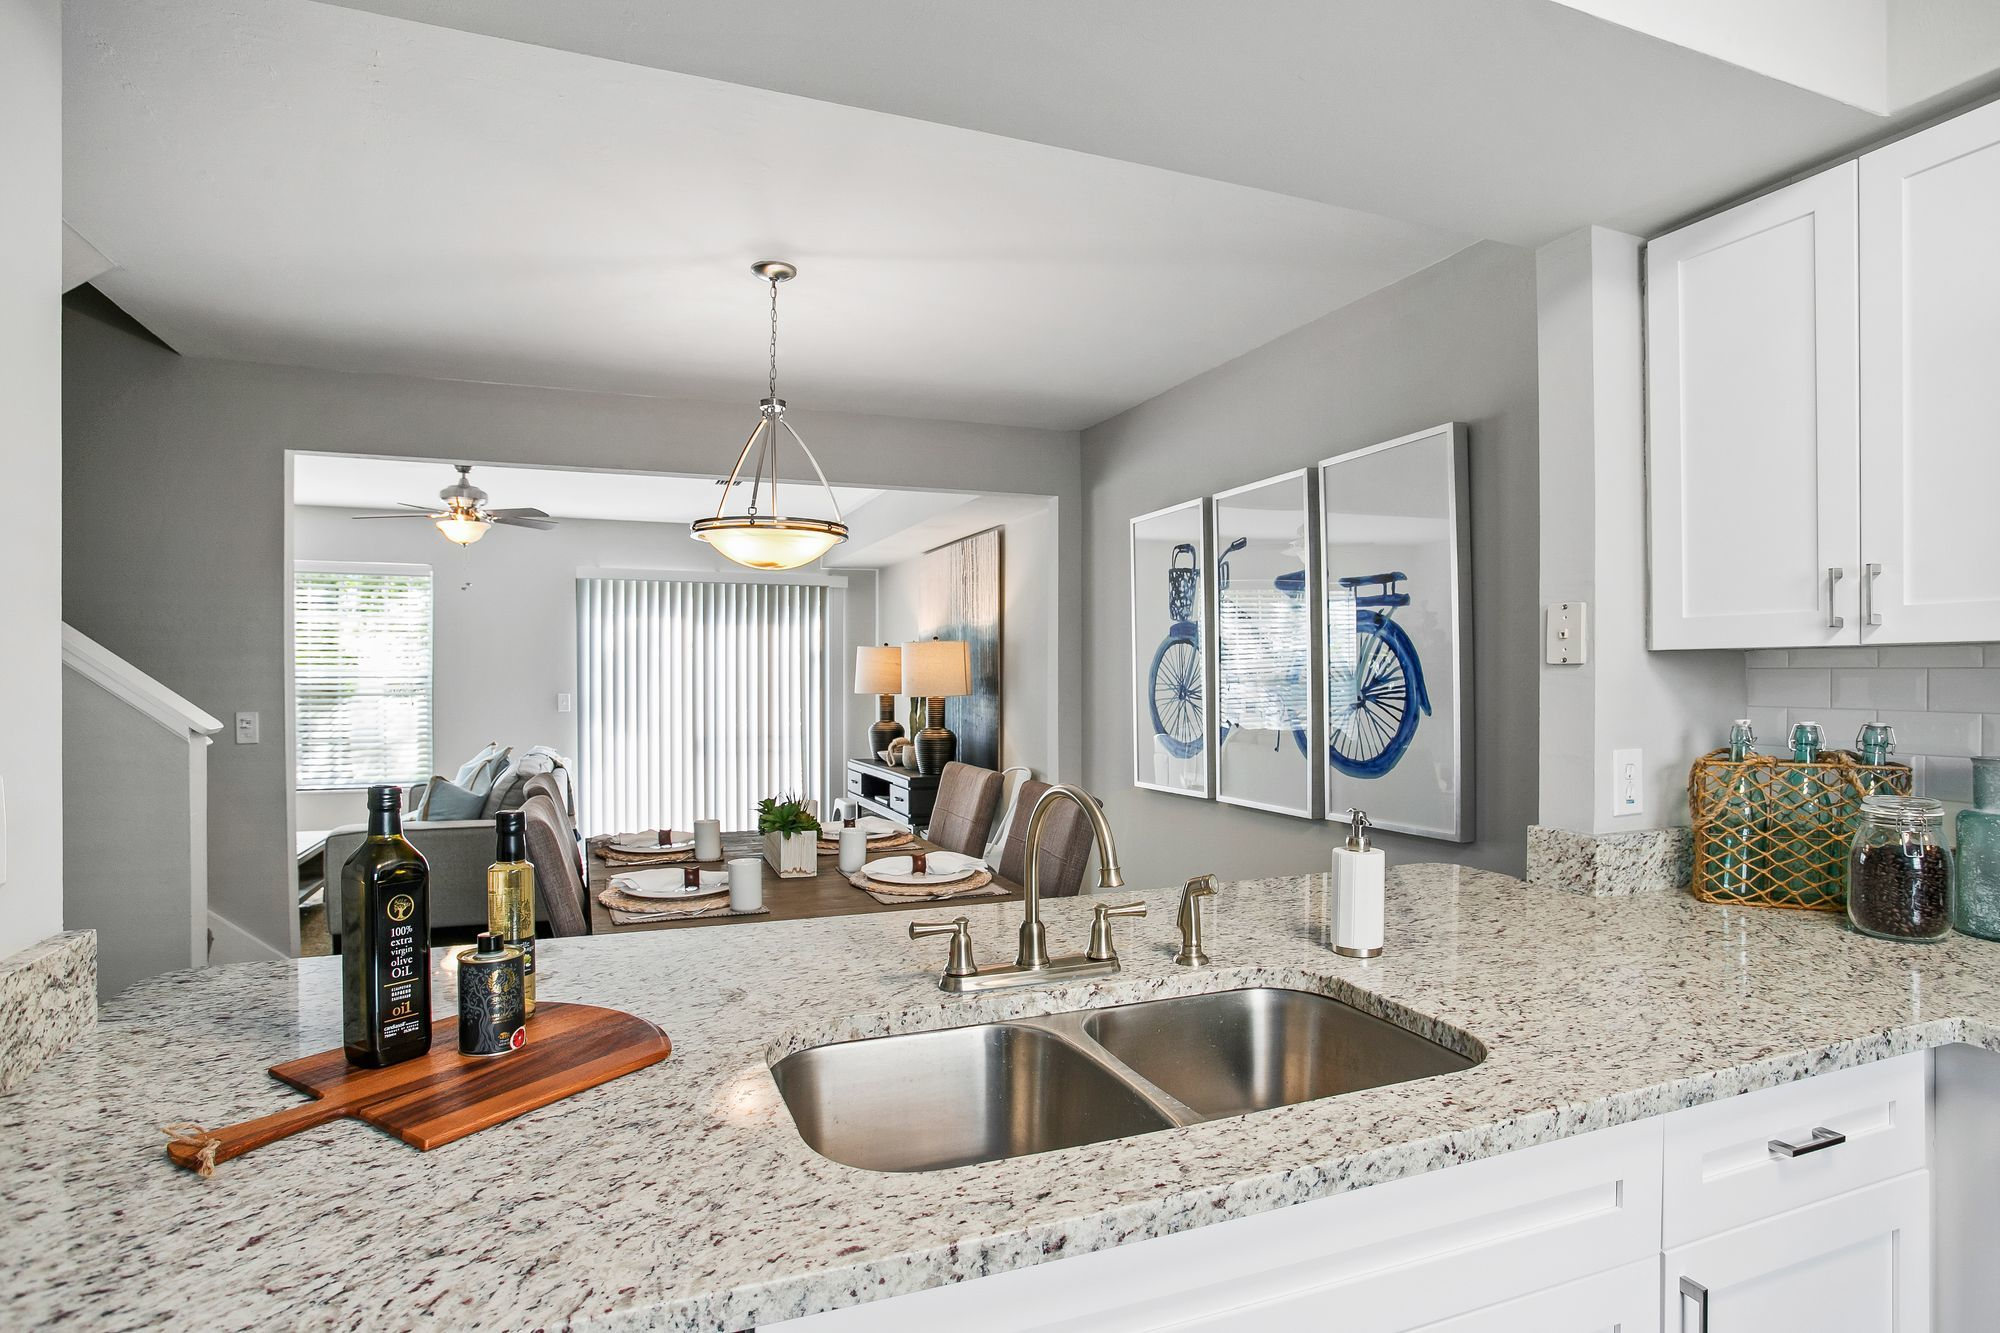 1531 Chesapeake AVE - Naples, FL apartments for rent